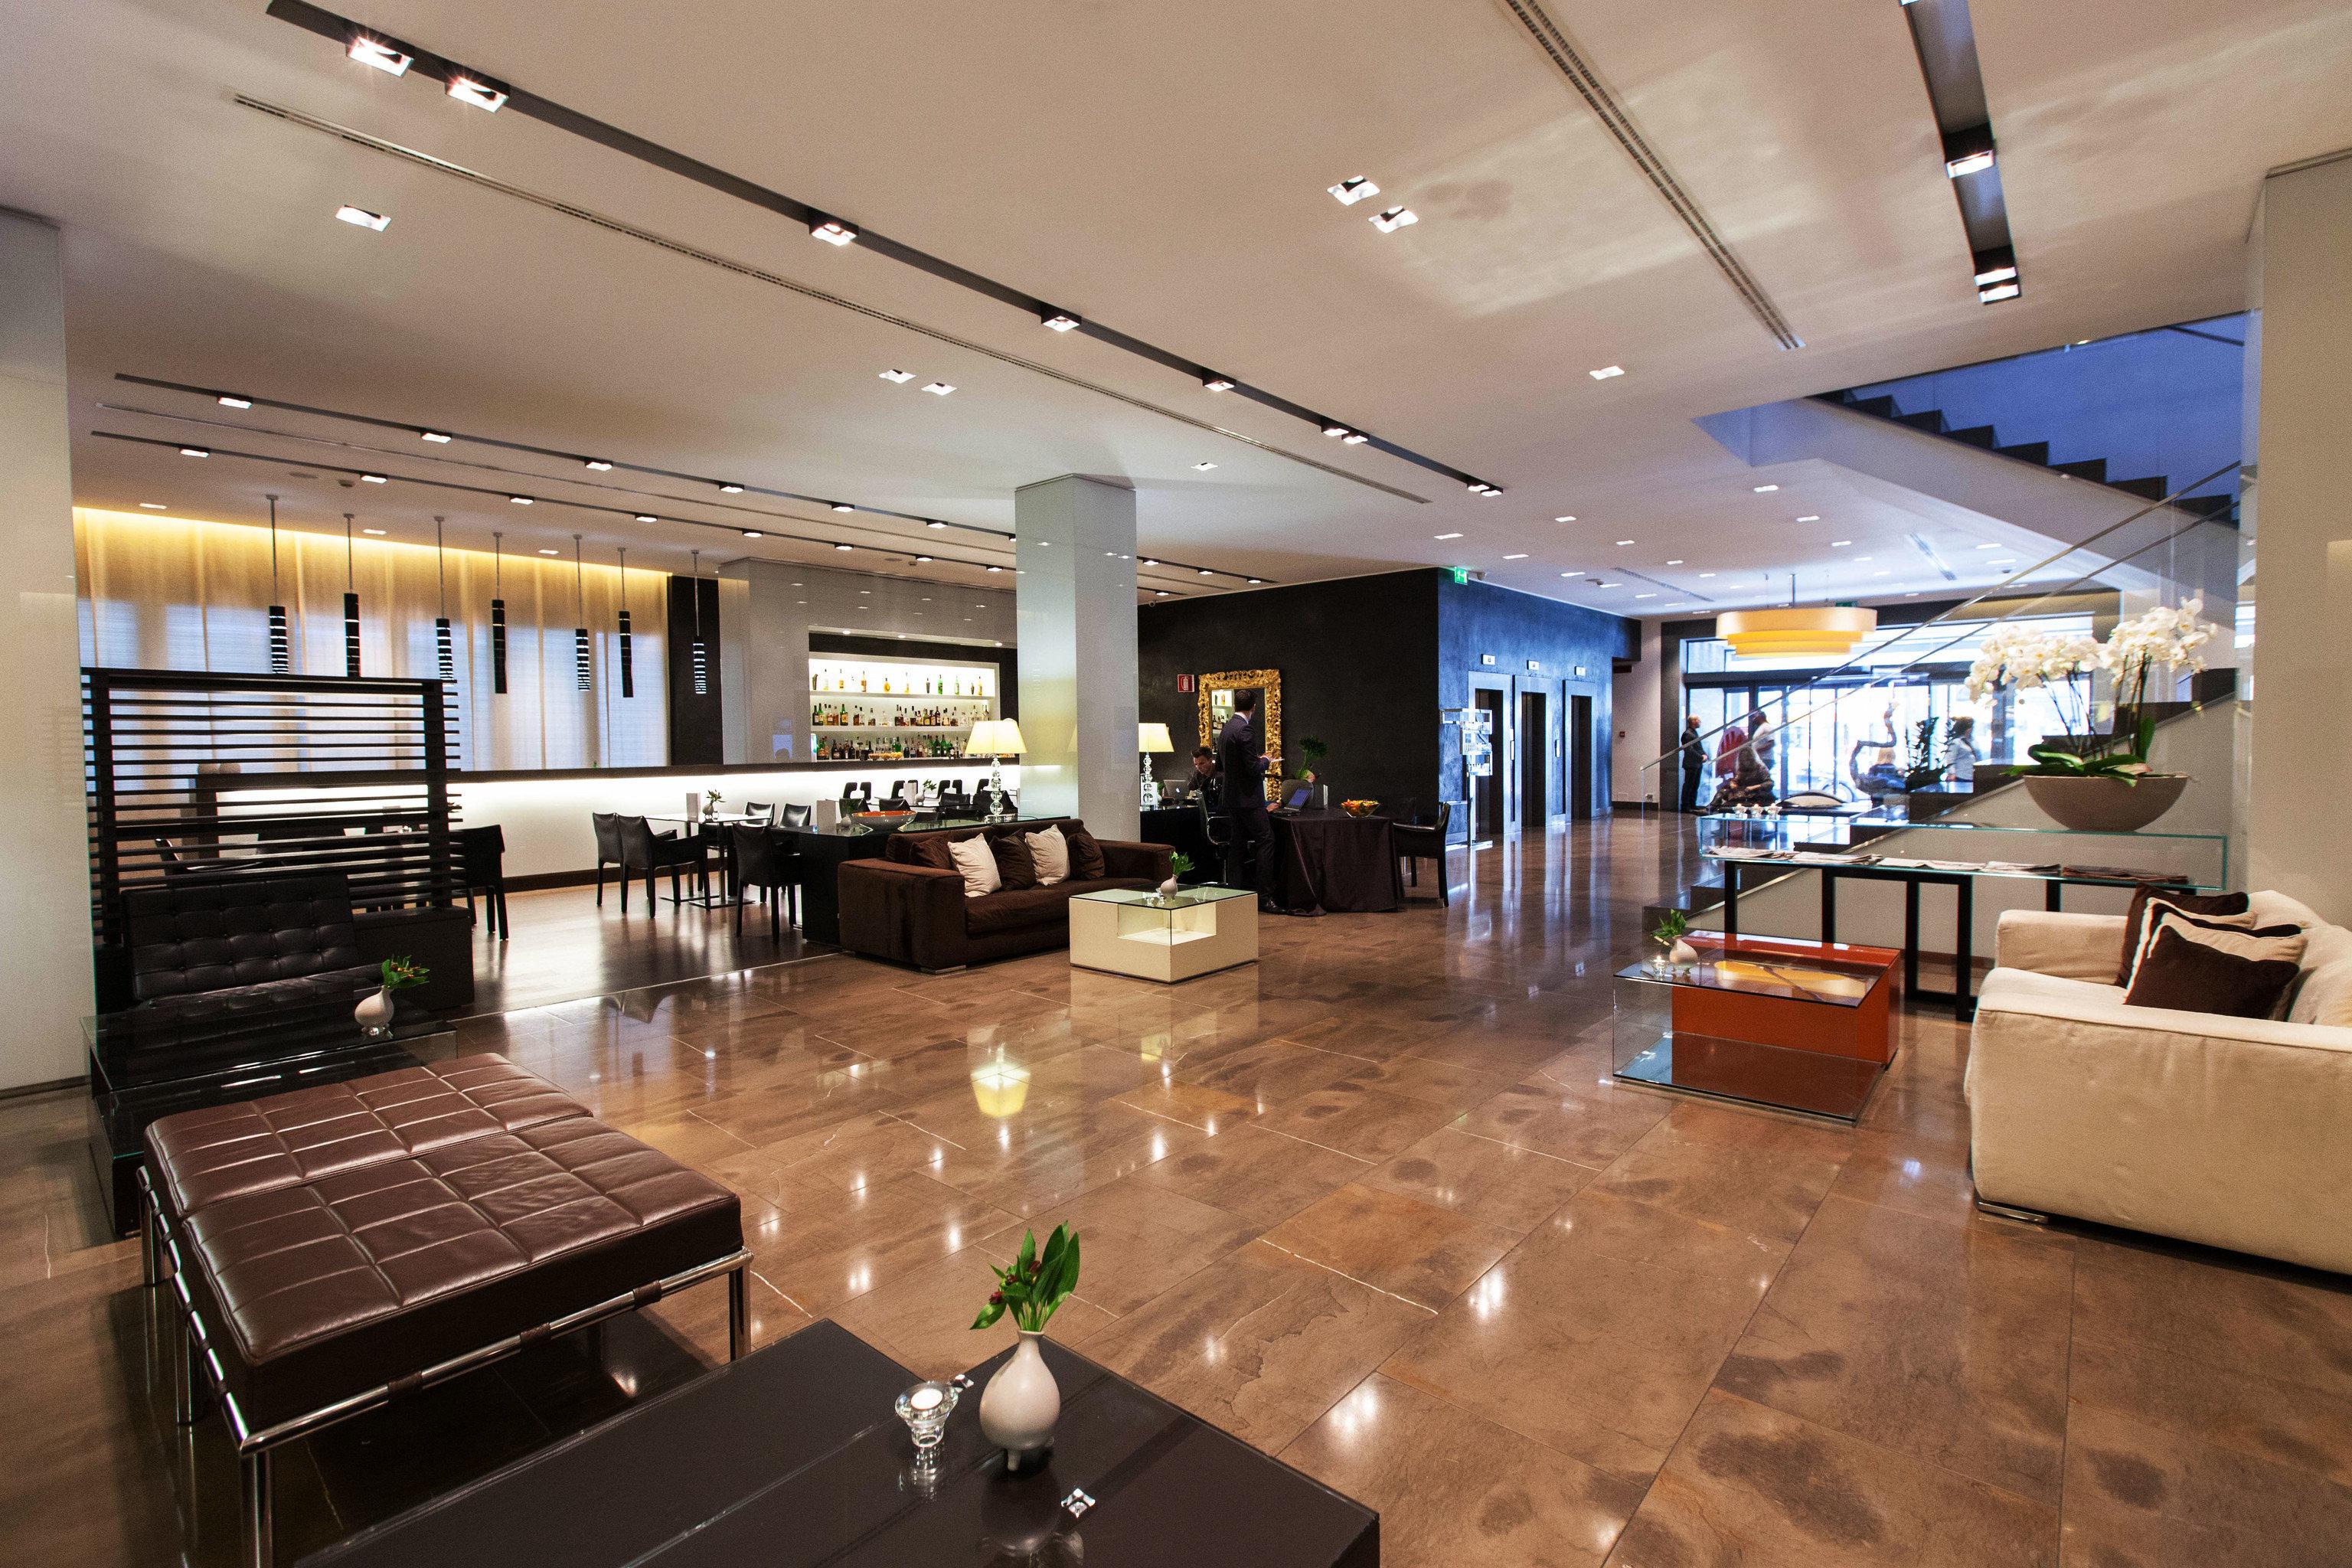 Lobby property recreation room condominium convention center headquarters shopping mall Modern